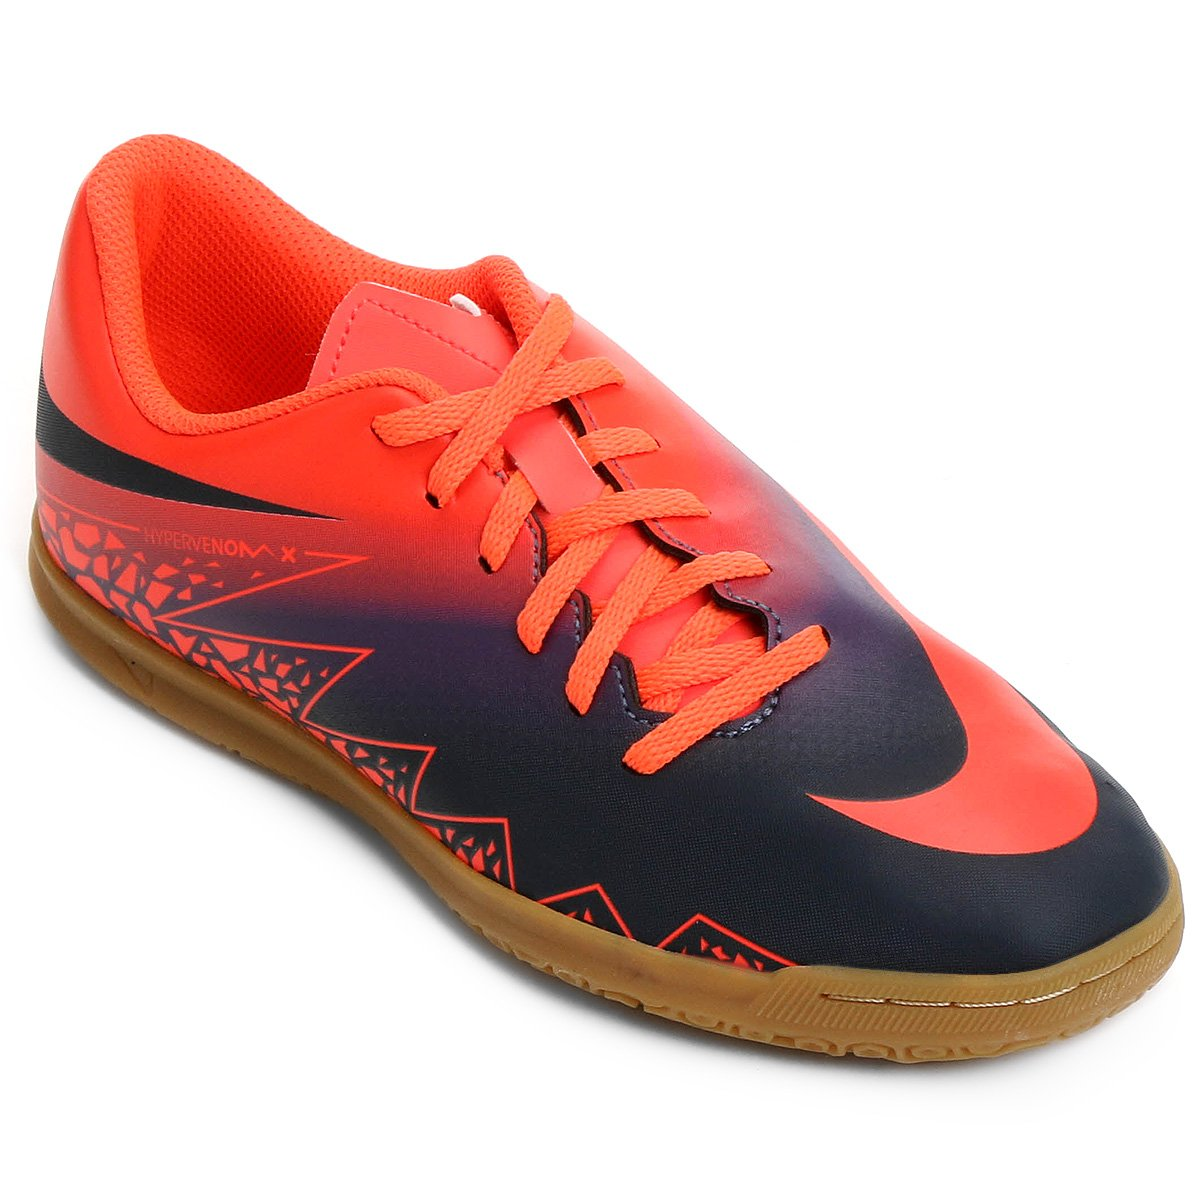 7548dd8348 Chuteira Futsal Infantil Nike Hypervenom Phade 2 IC - Compre Agora ...